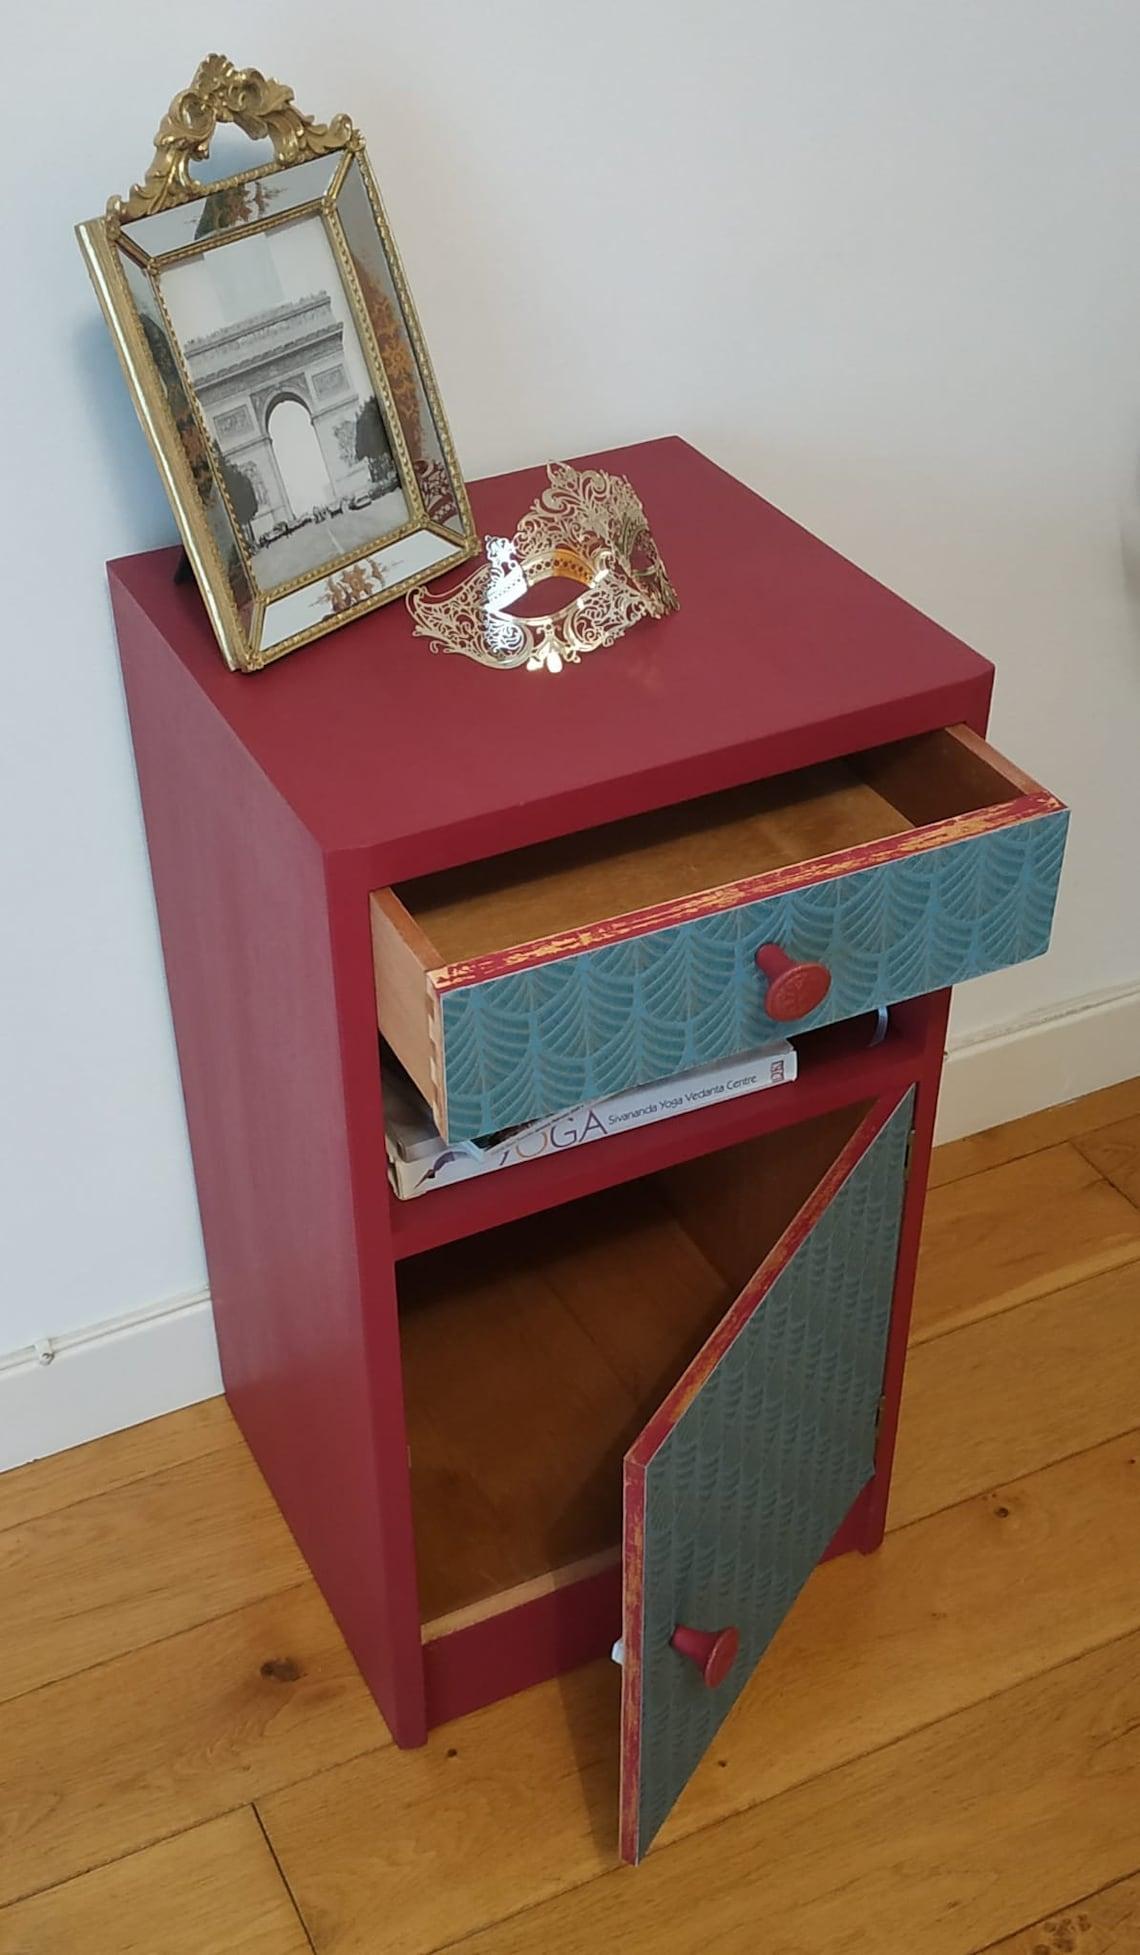 Original Herber E.Gibbs upcycled bedside table 1960s